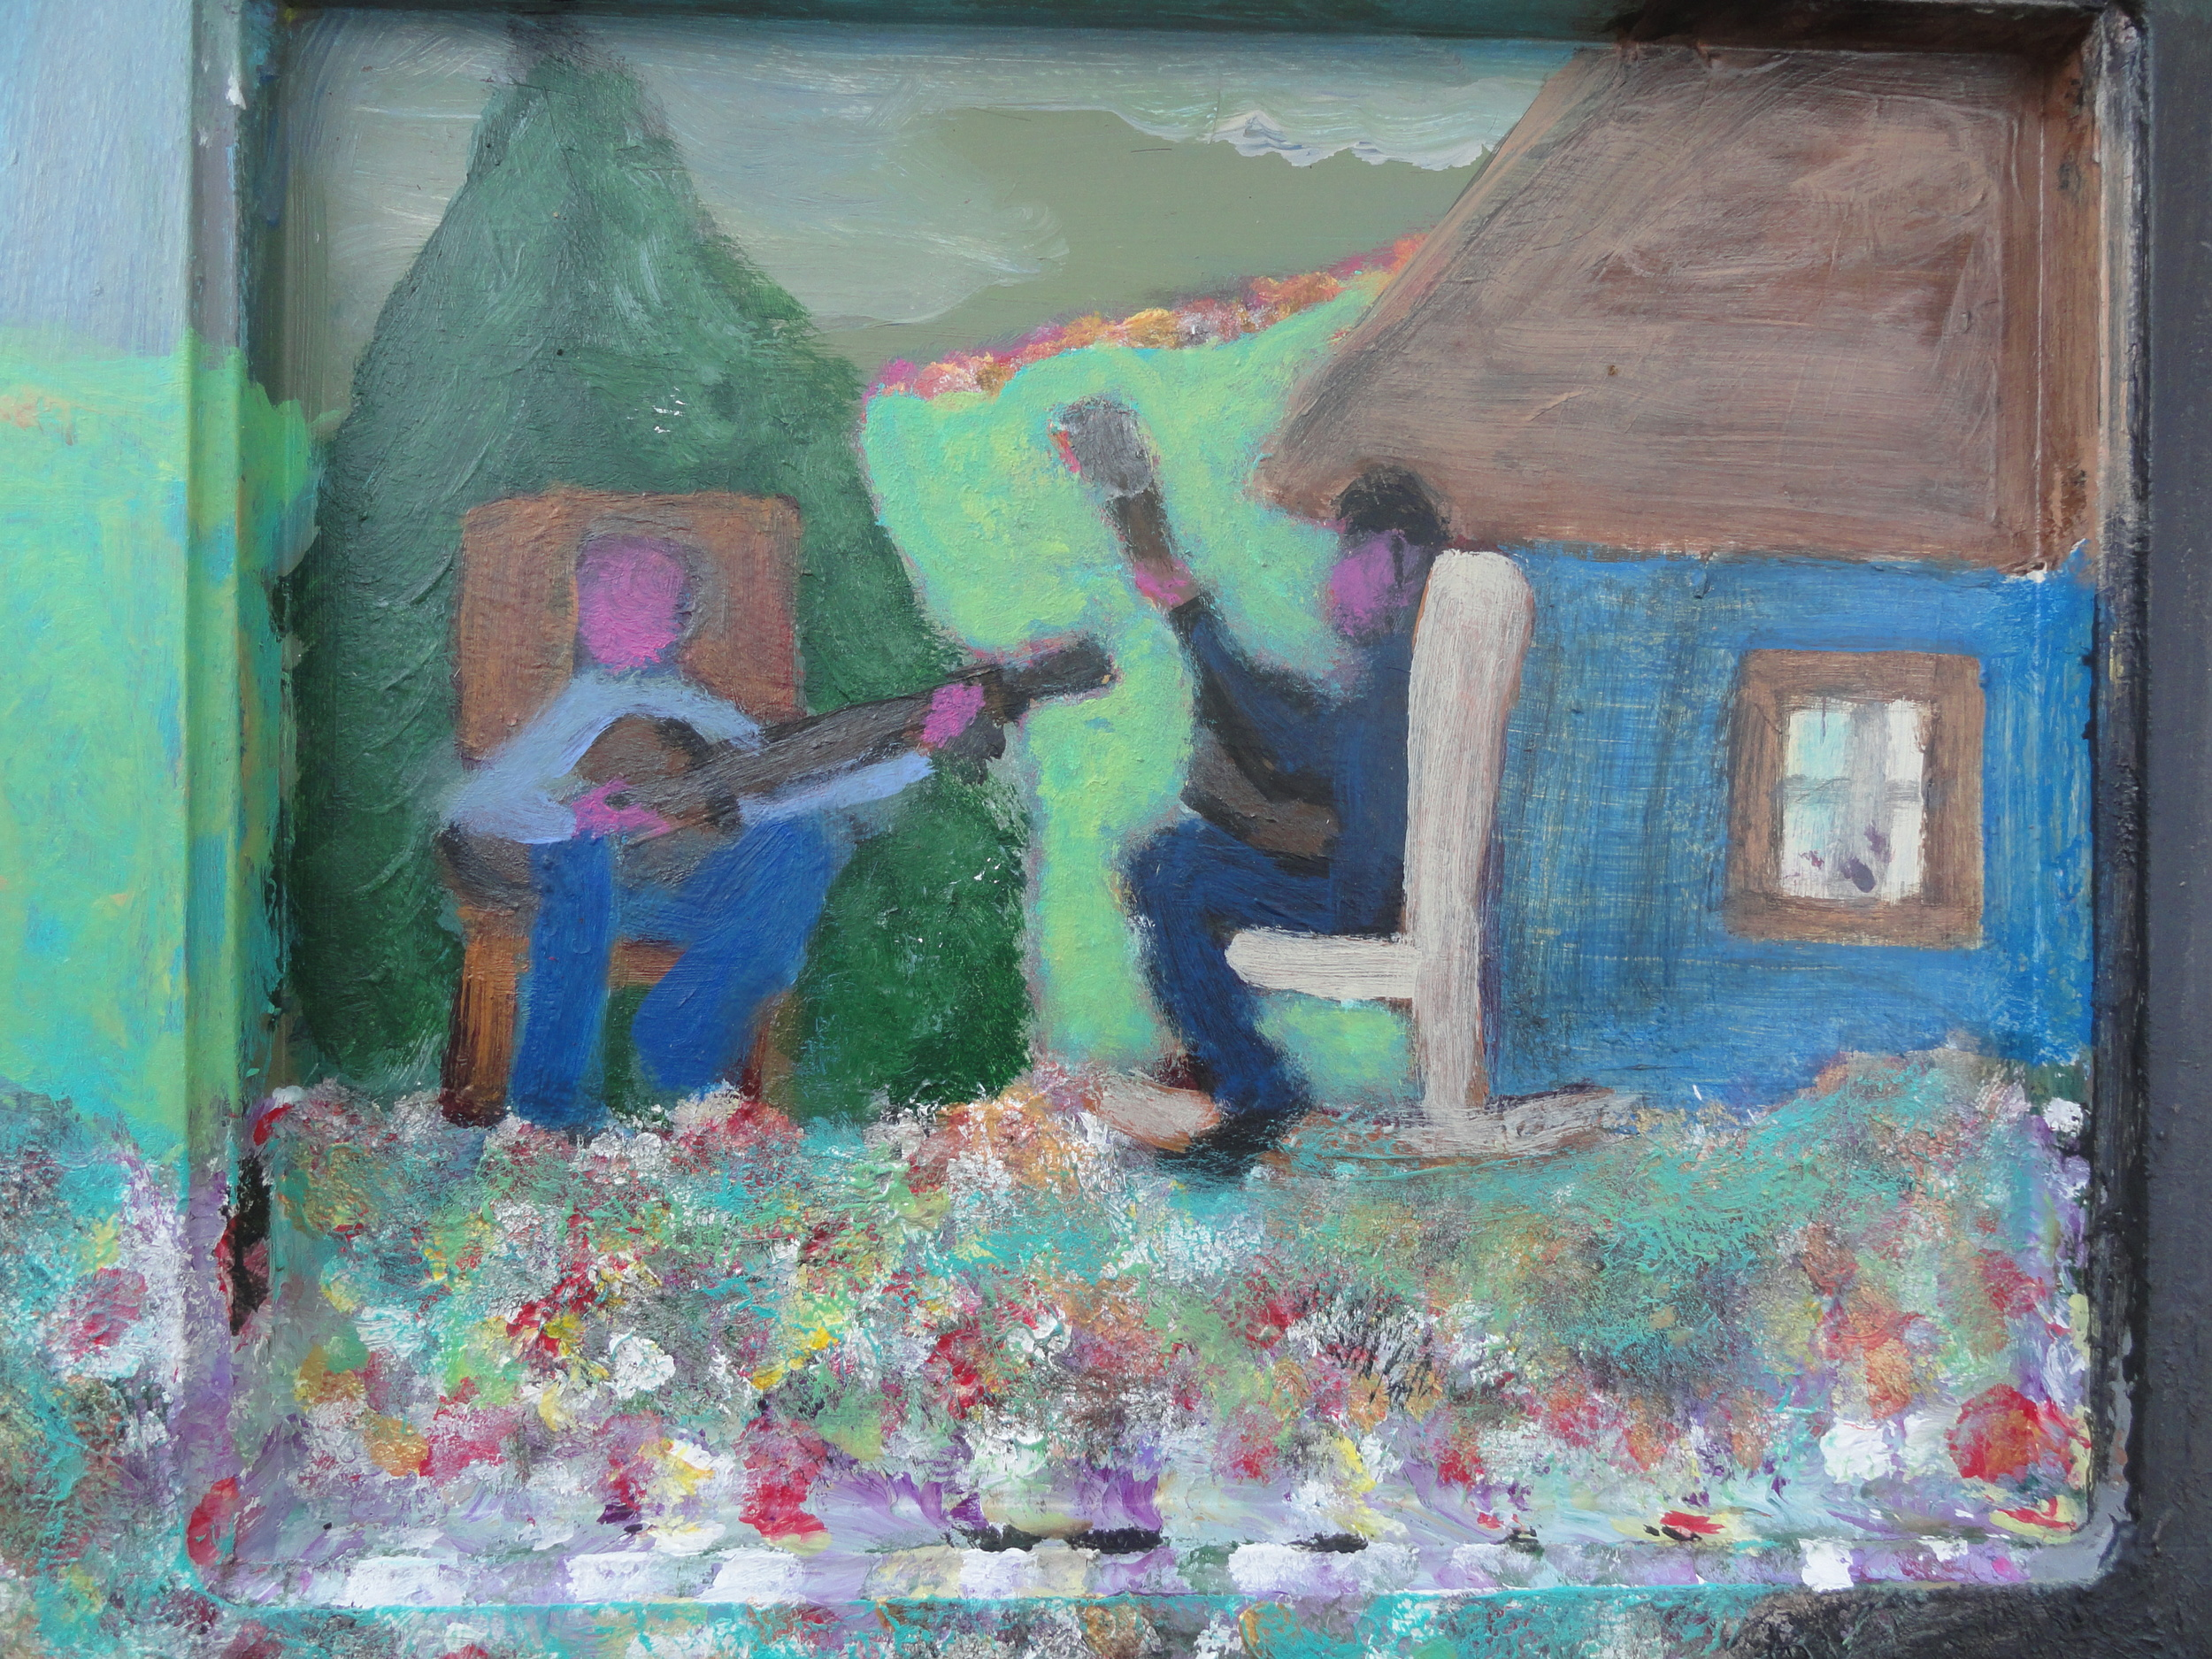 painting April 2015 001.JPG